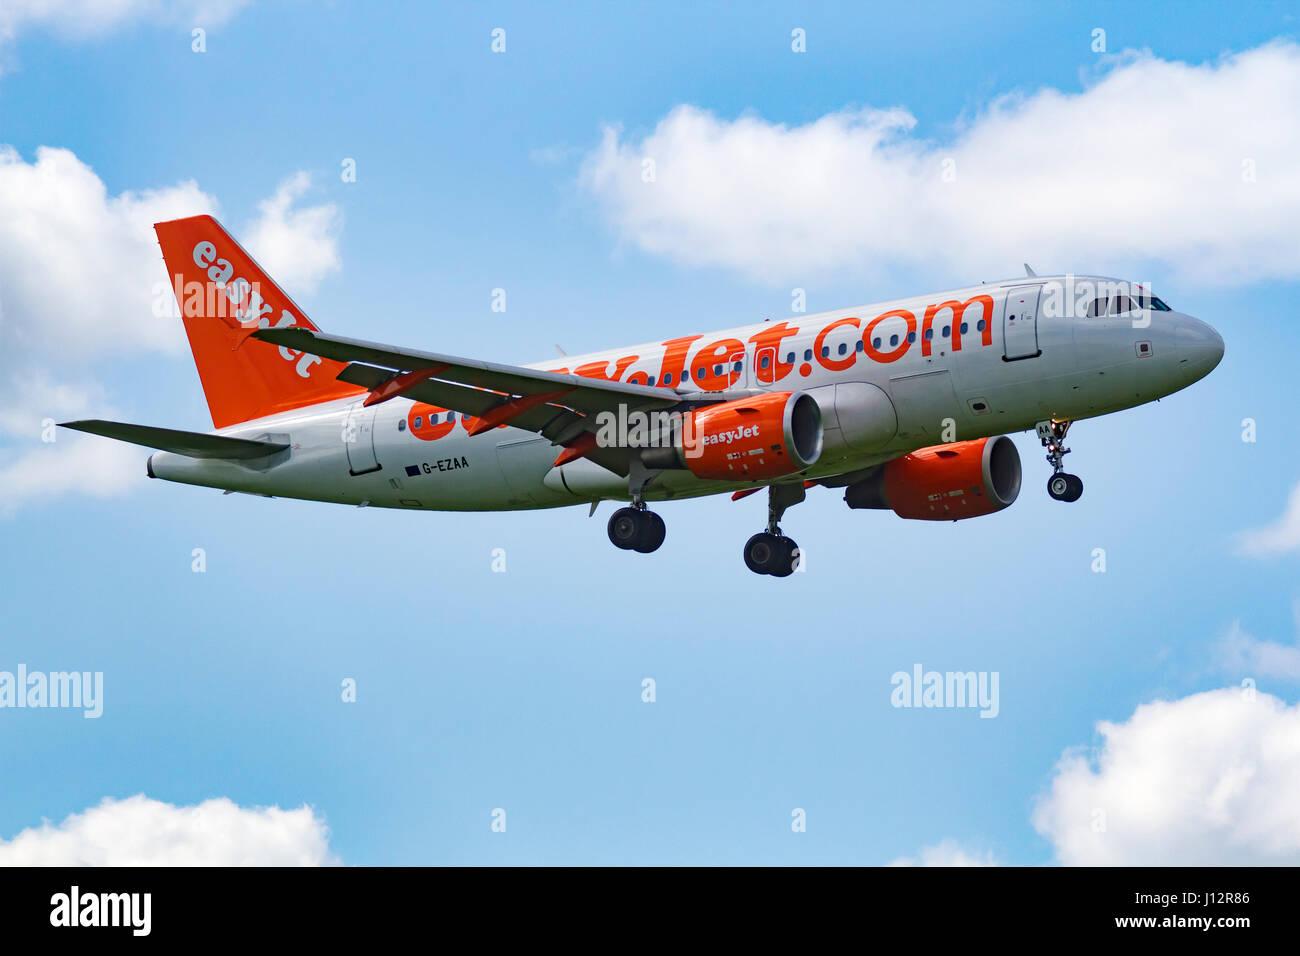 Easyjet Plane G- EZAA Airbus A319-111 landing at Manchester Airport - Stock Image